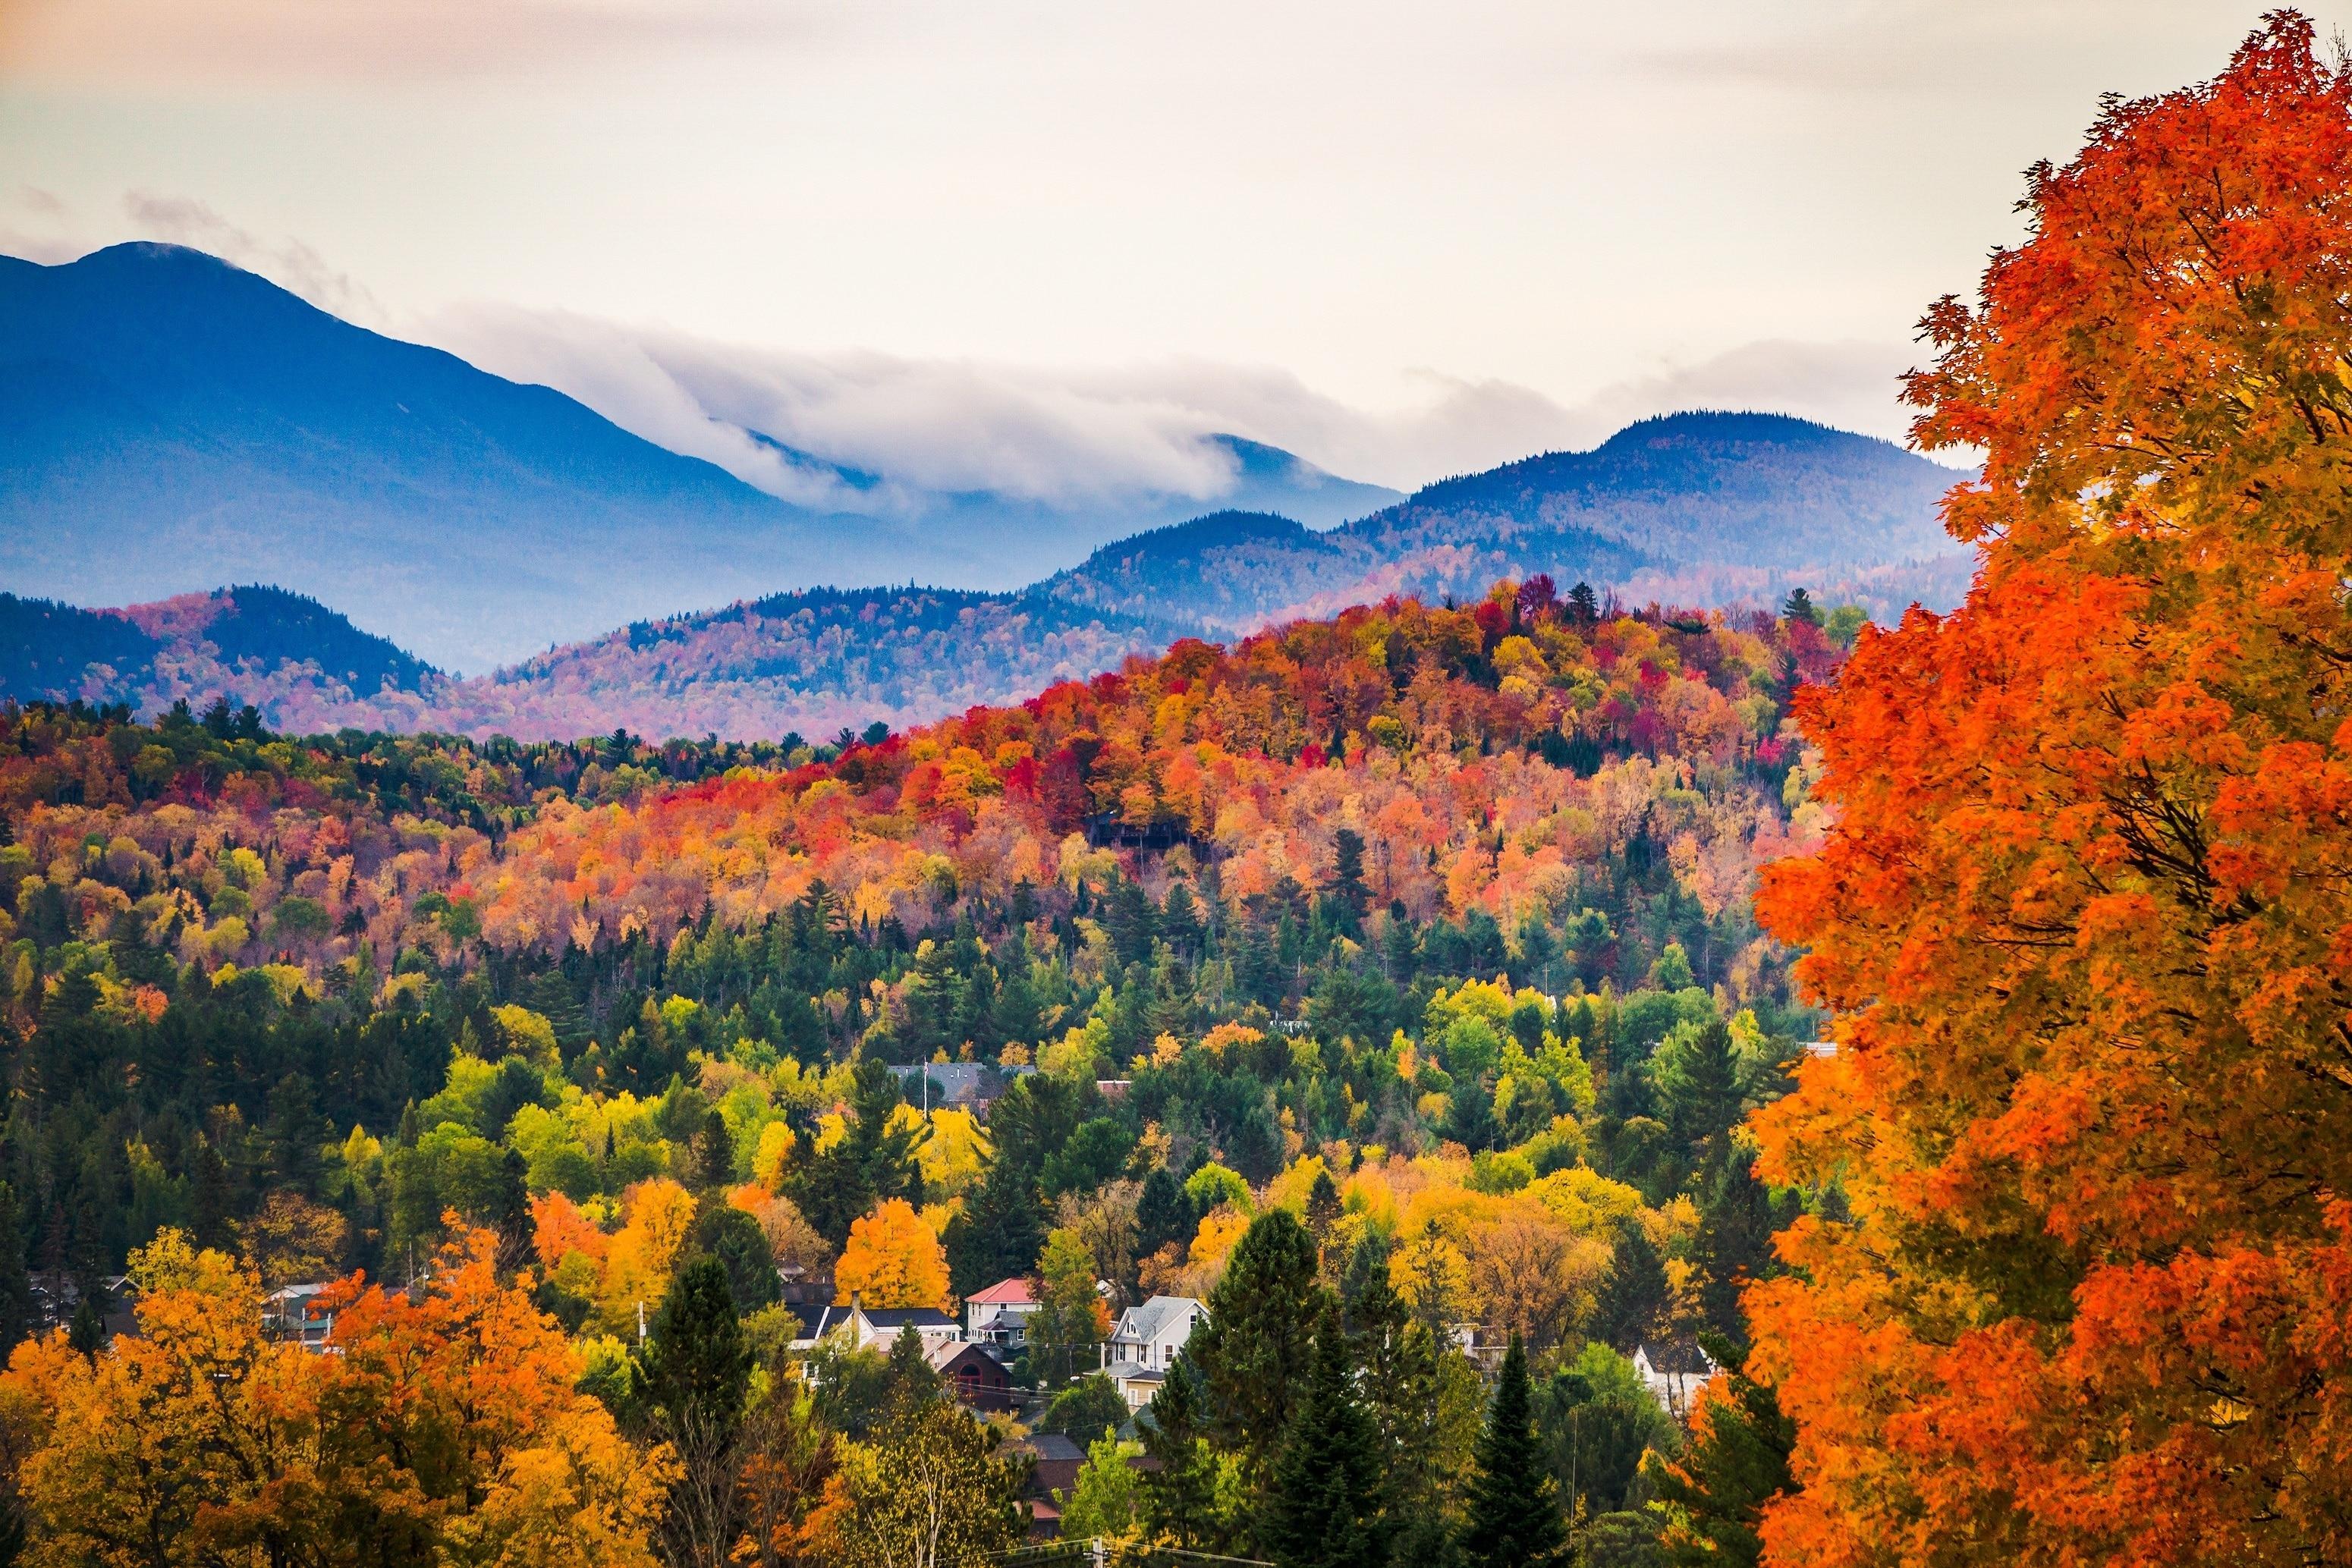 Adirondack, New York, United States of America